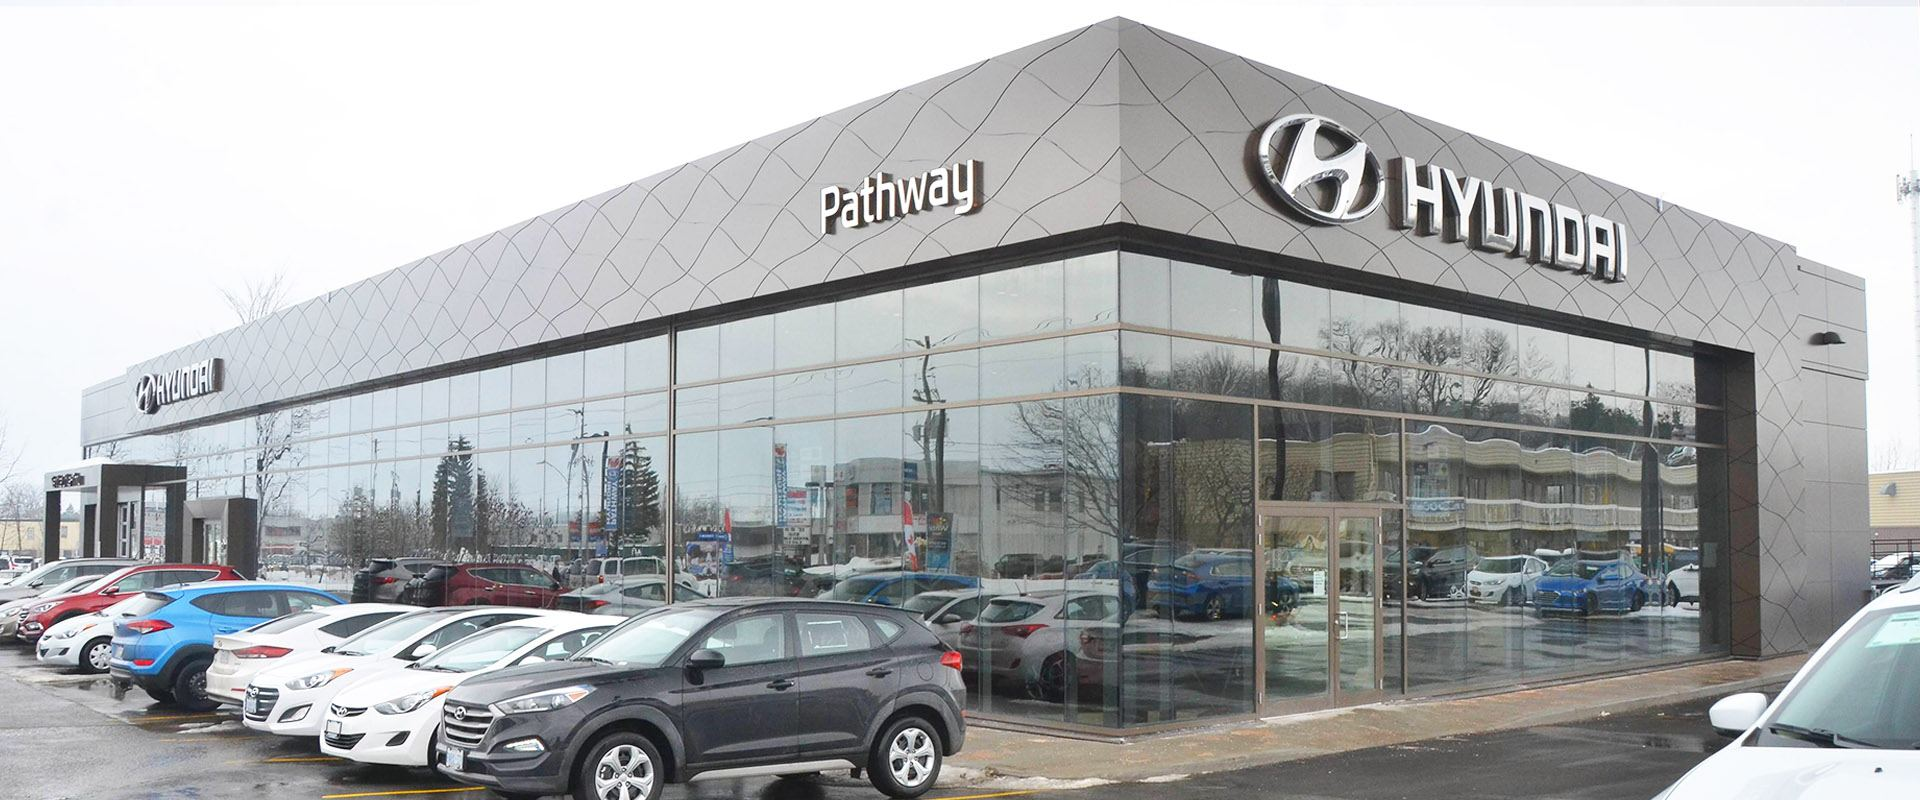 New Pathway Hyundai Building in Ottawa ON